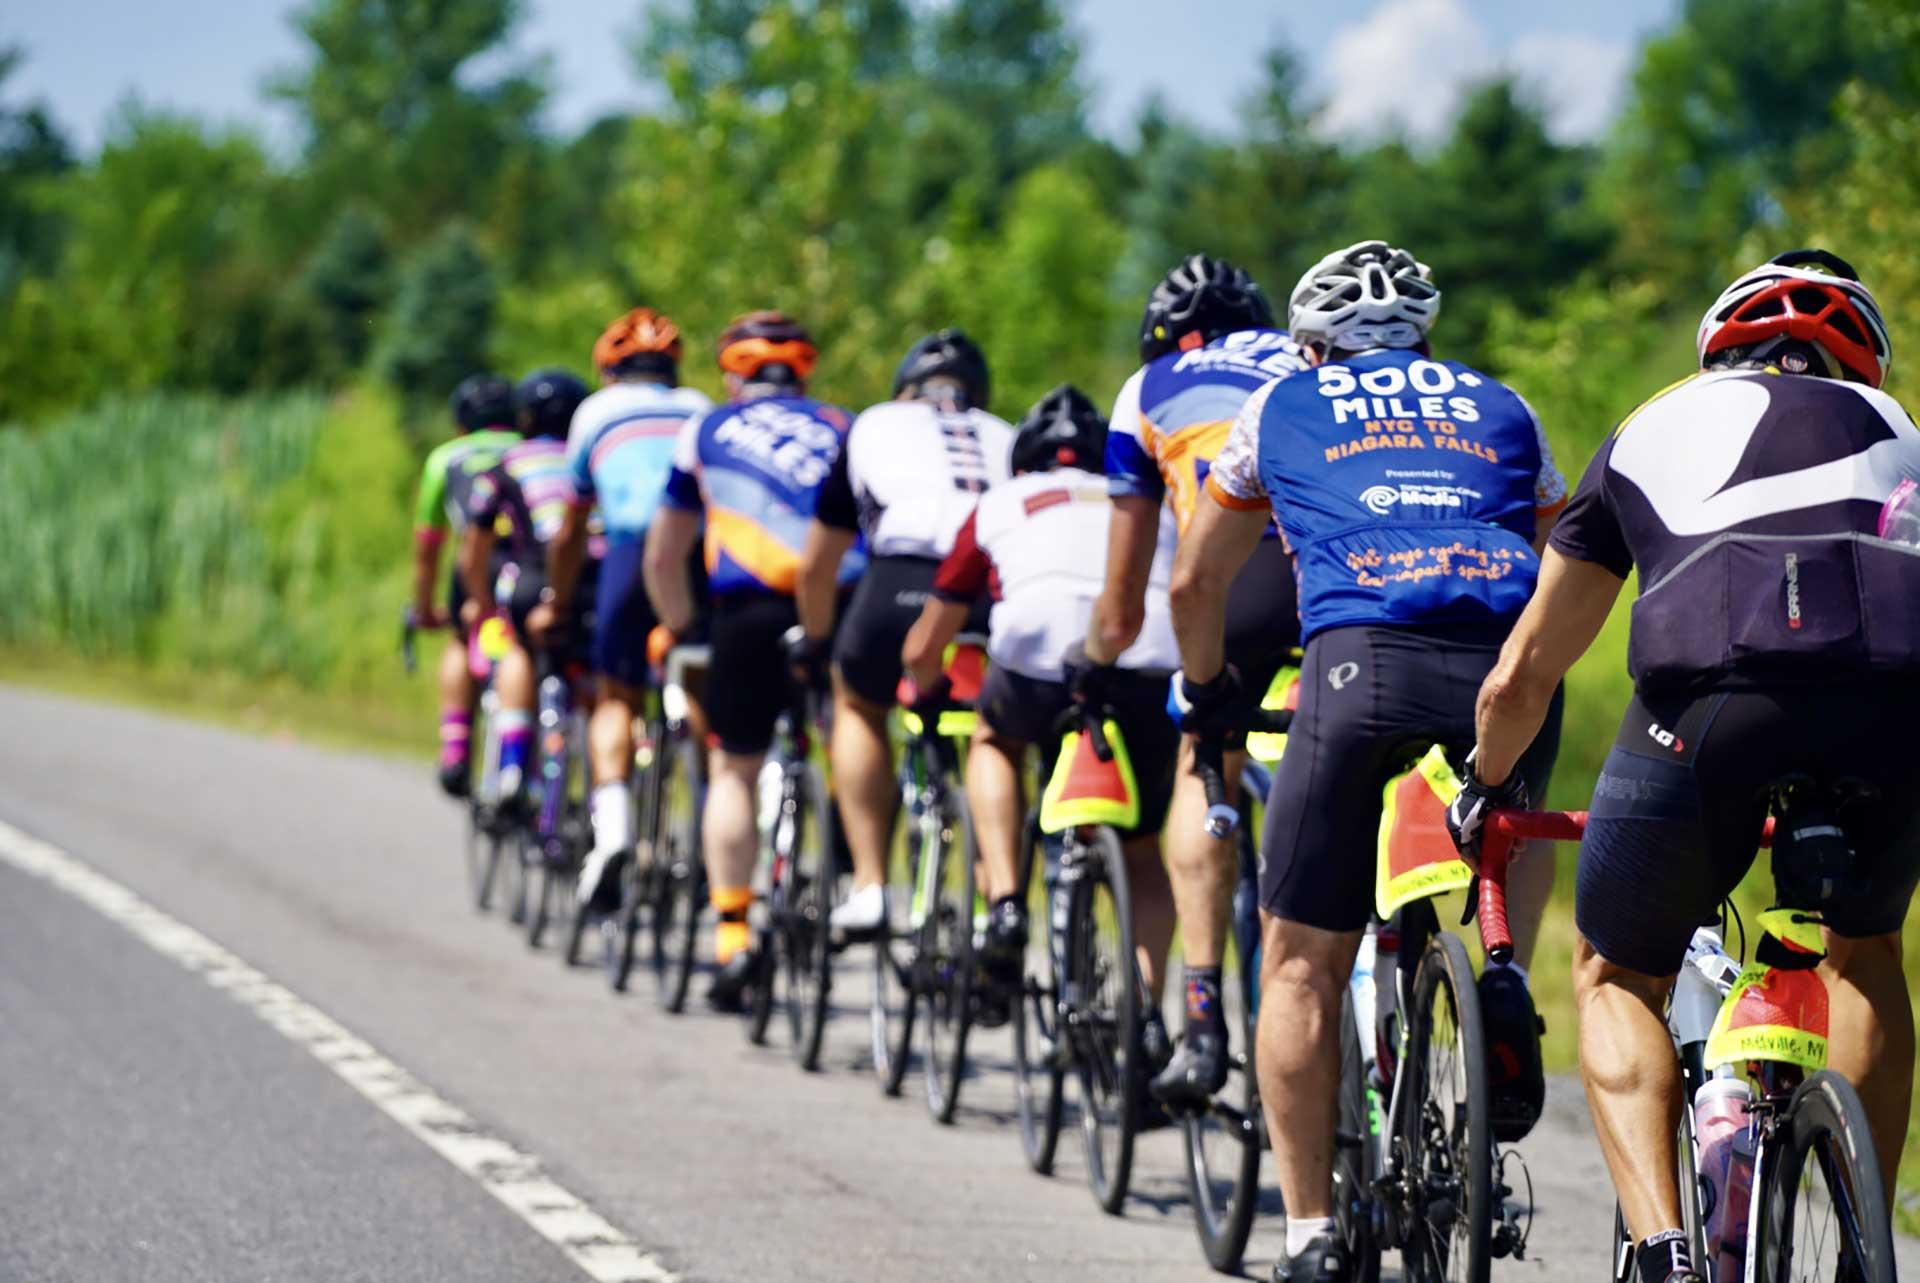 Charlie's tips for safe paceline riding